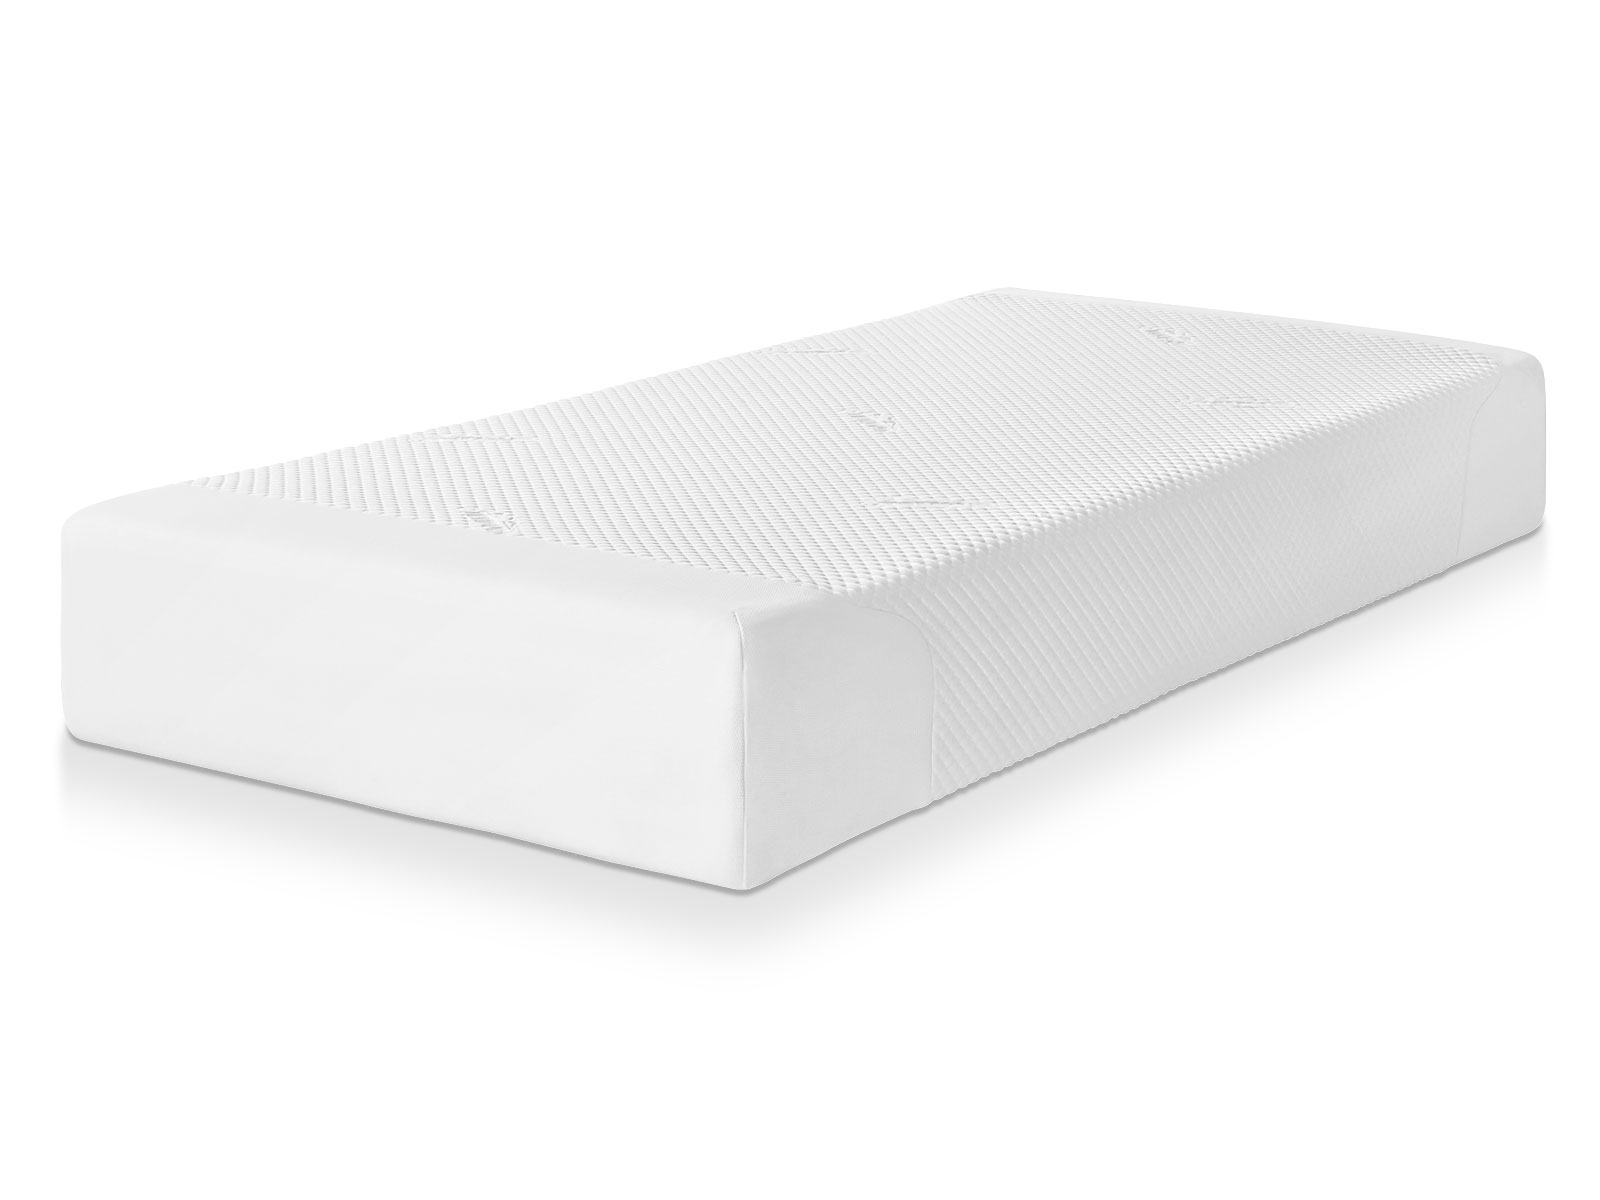 tempur matratze cloud 25 betten prinz gmbh. Black Bedroom Furniture Sets. Home Design Ideas